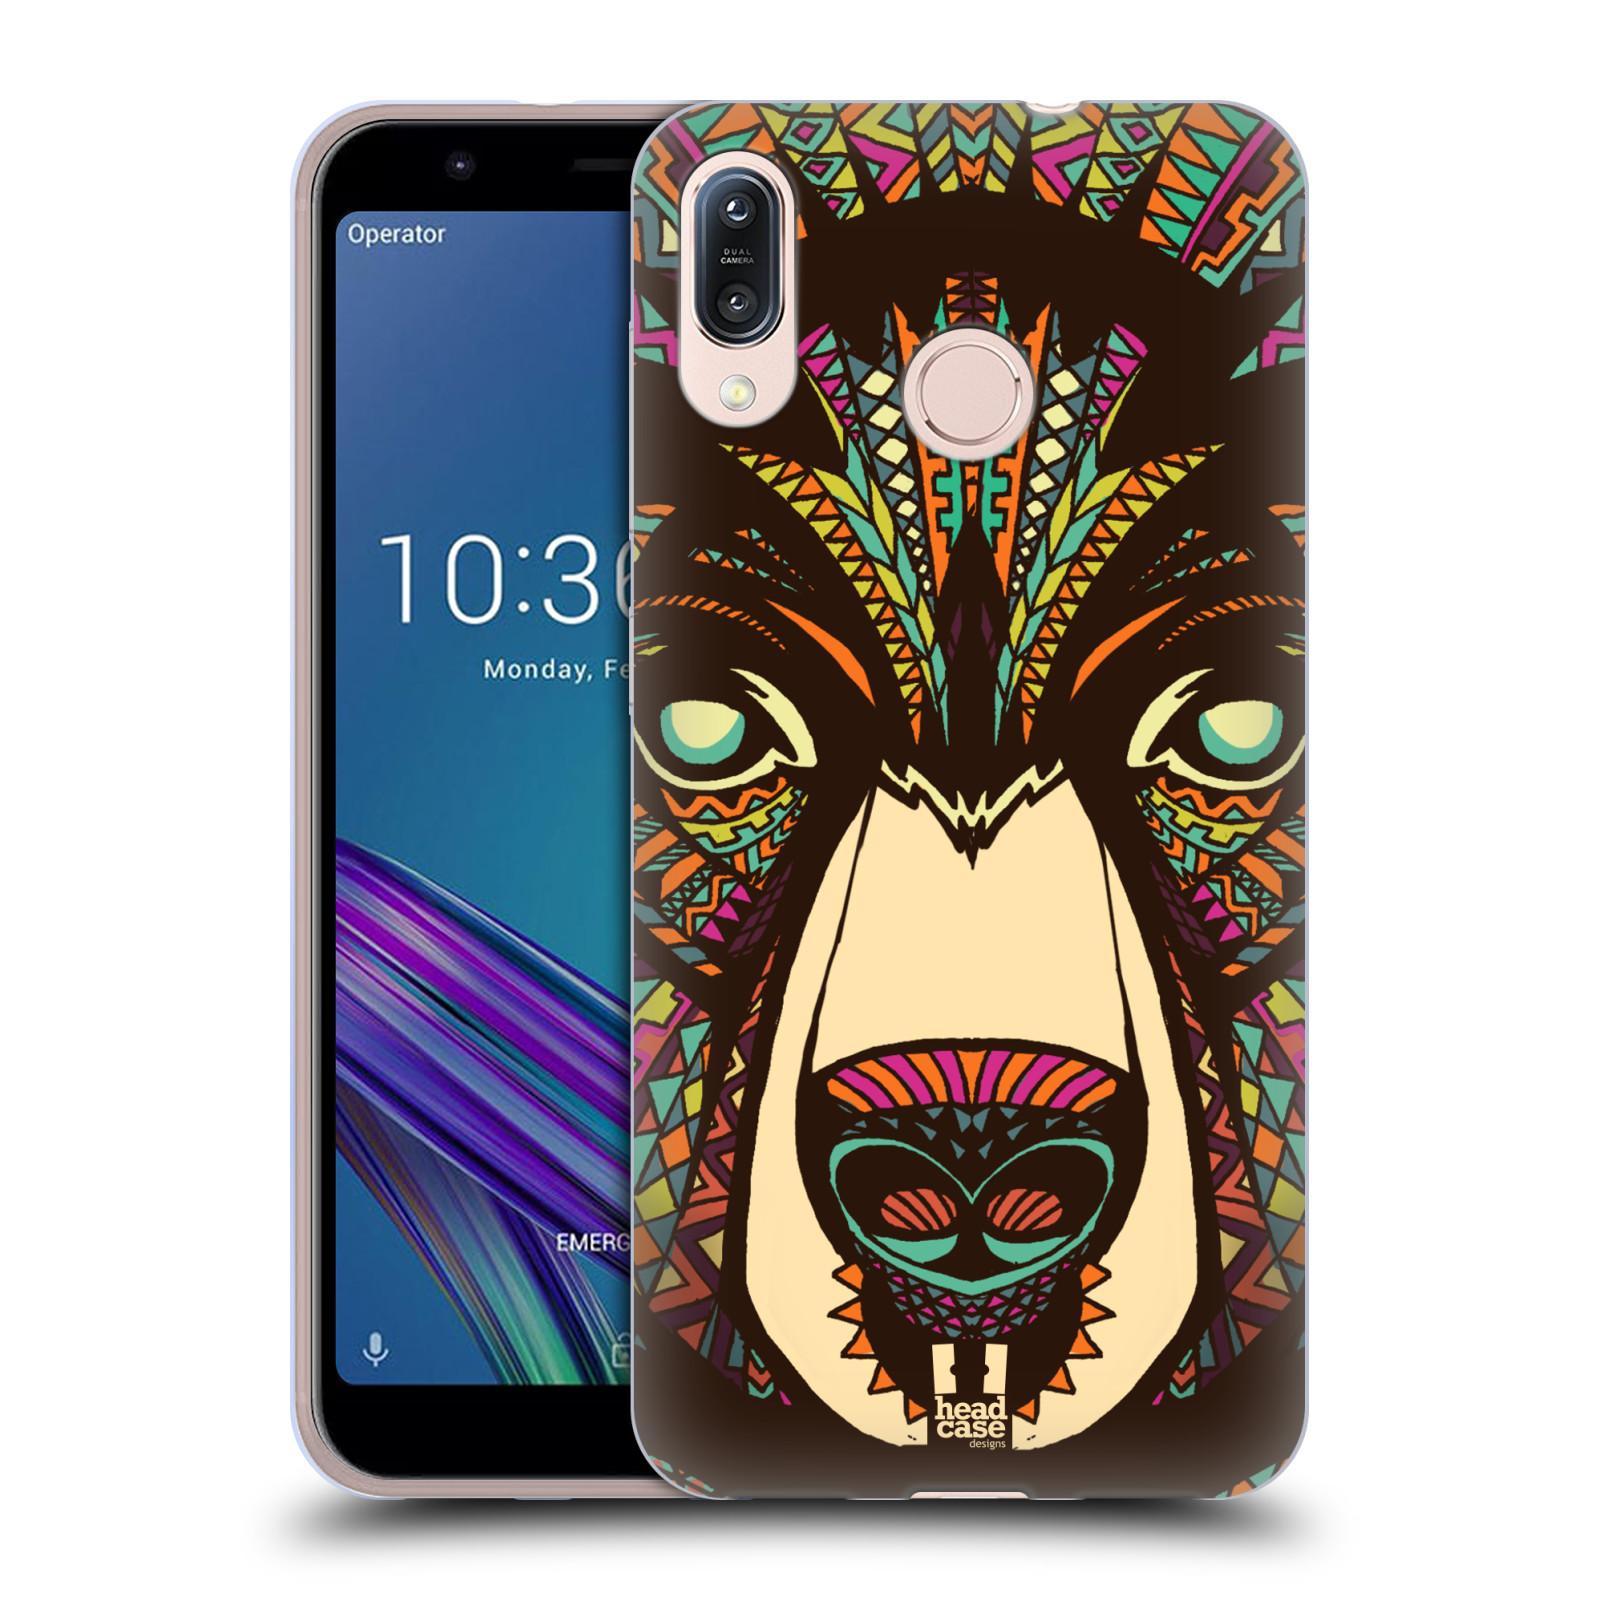 Silikonové pouzdro na mobil Asus Zenfone Max M1 ZB555KL - Head Case - AZTEC MEDVĚD